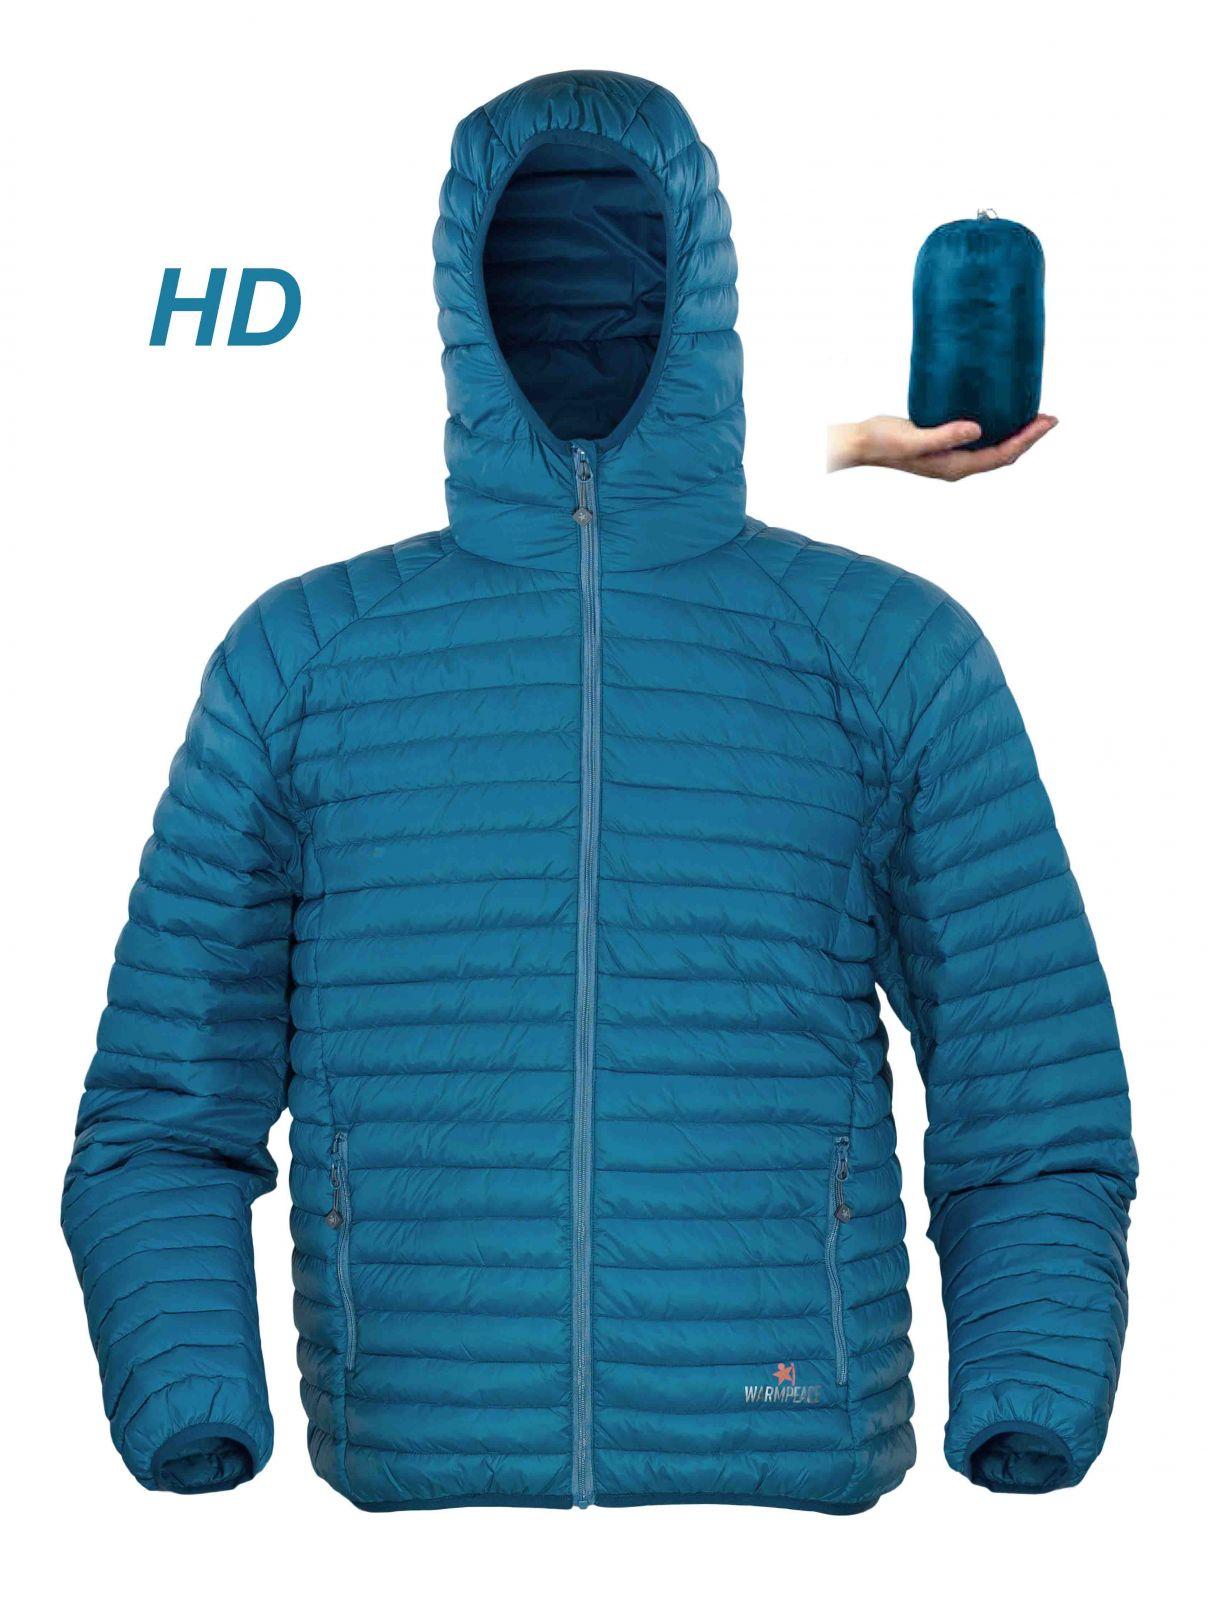 Warmpeace Nordvik HD blue péřová bunda